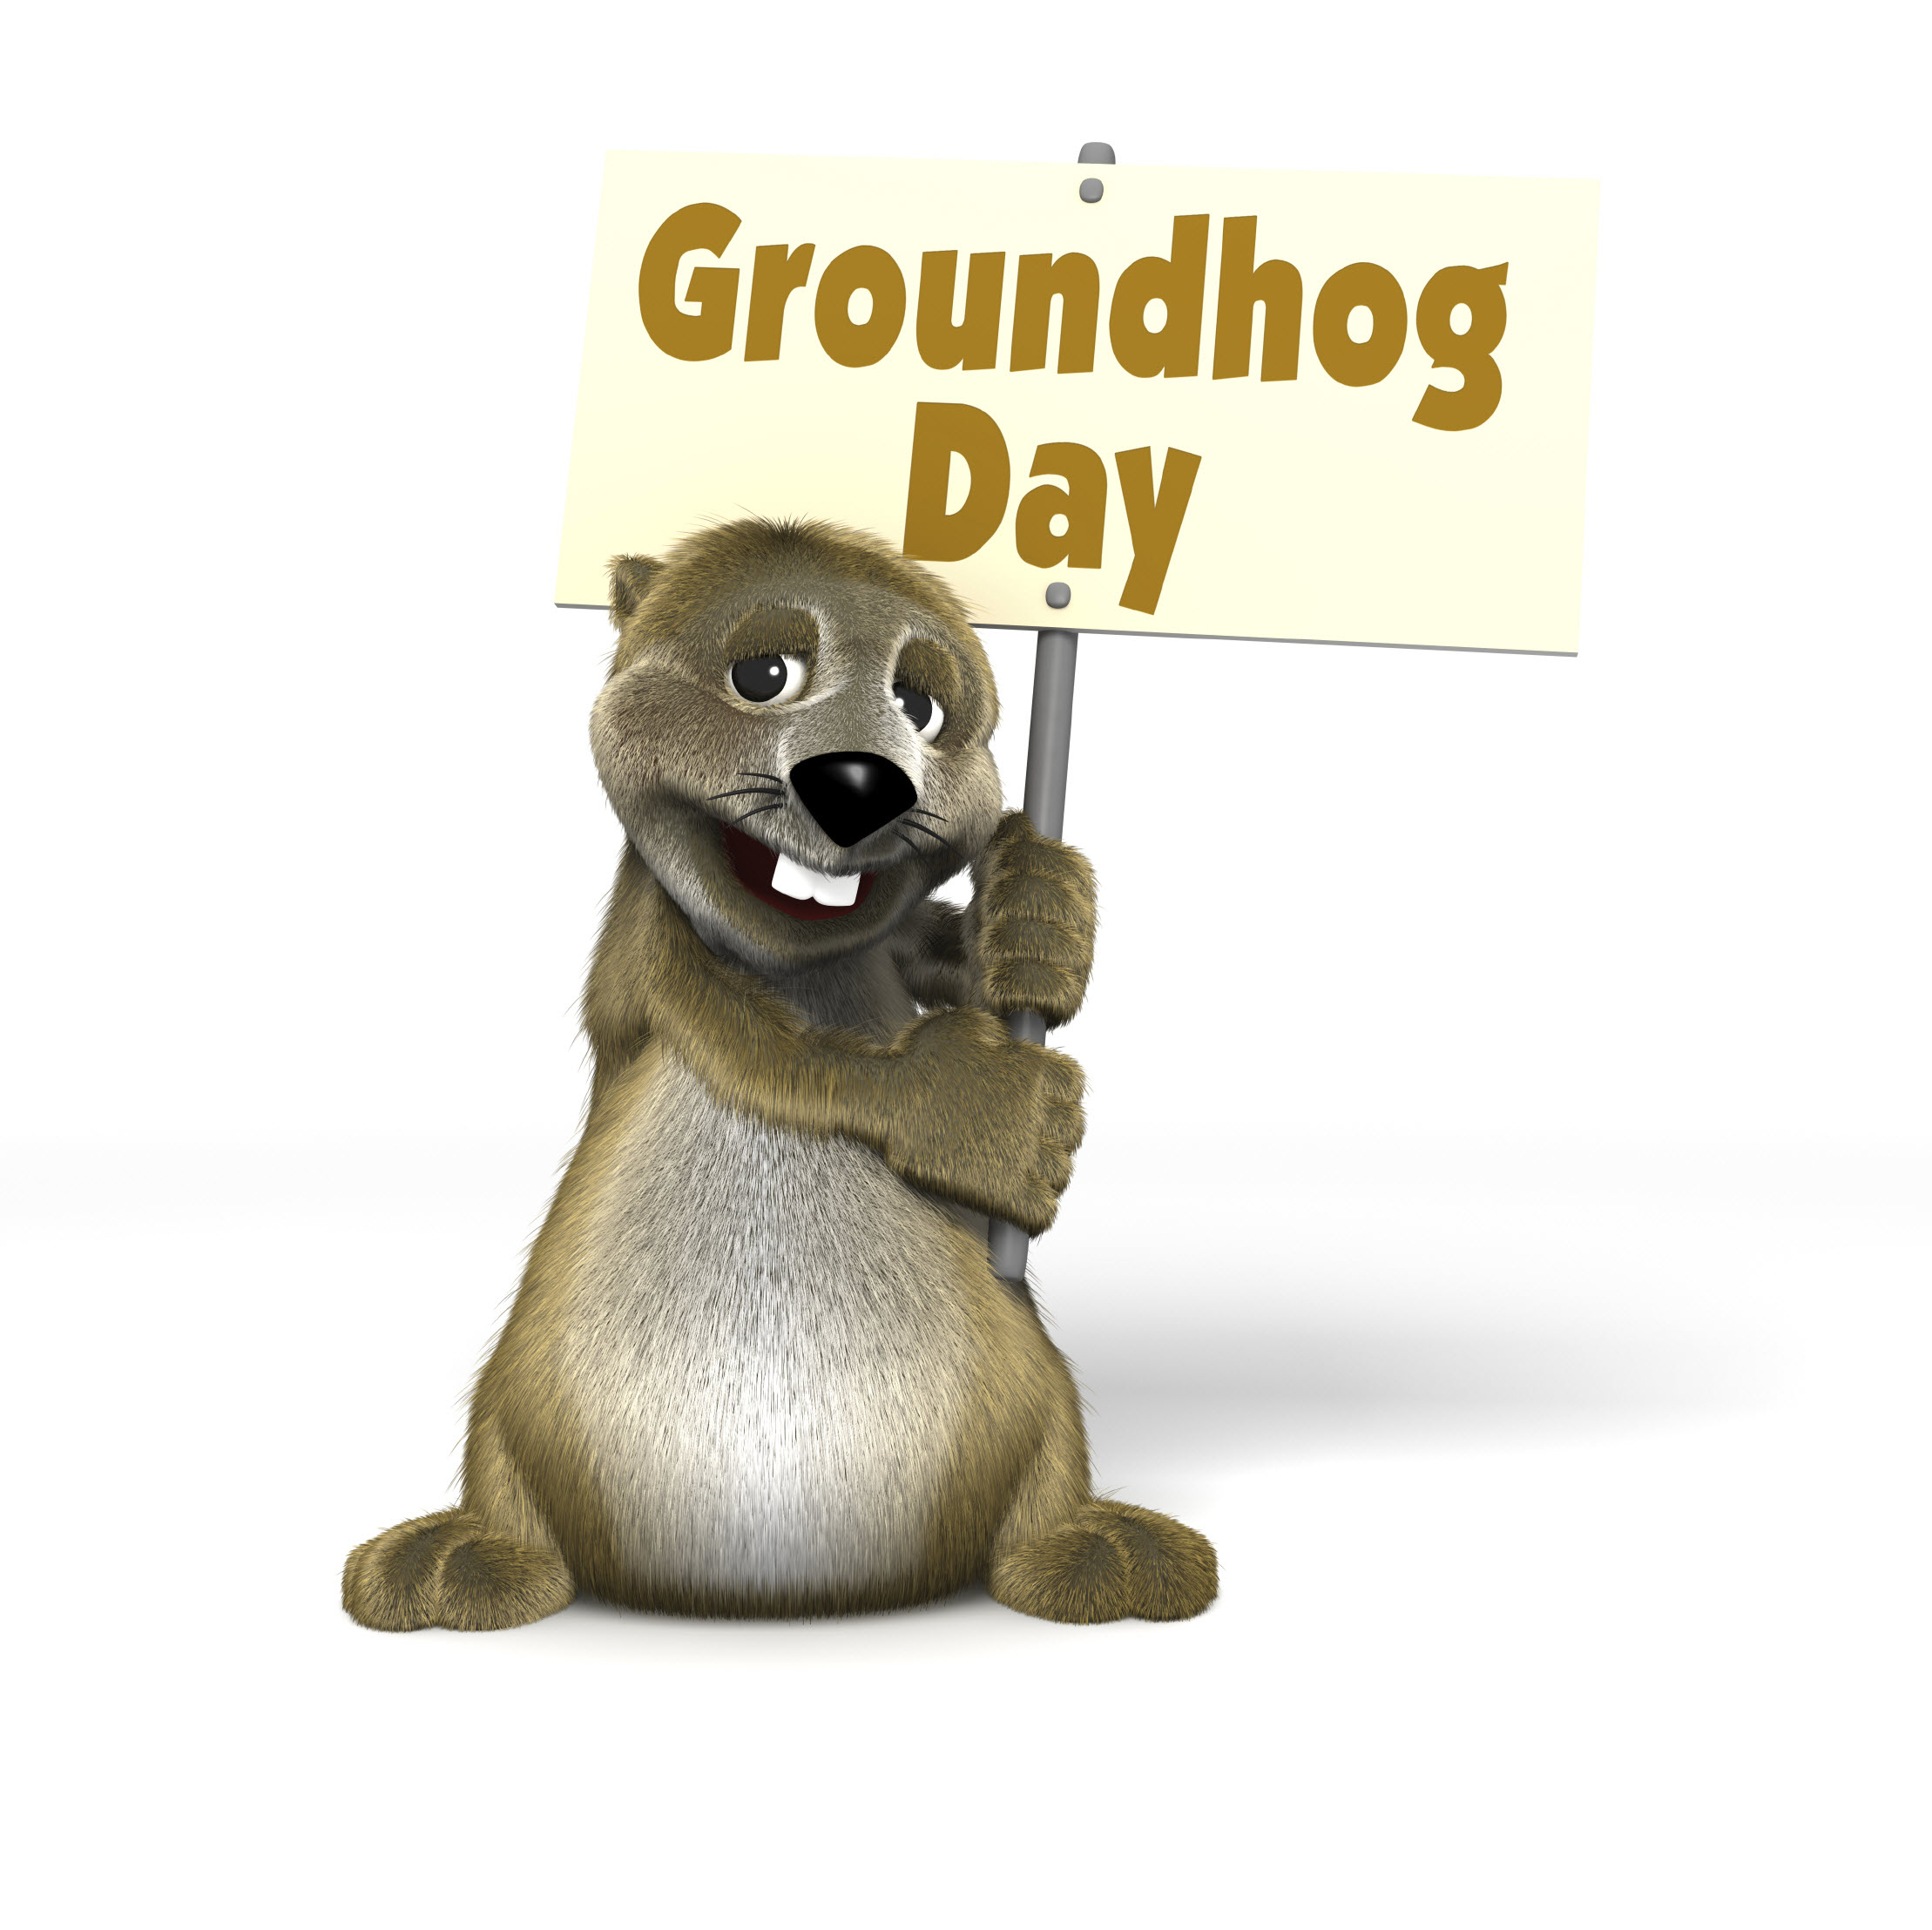 Groundhog Birthday Quotes. QuotesGram